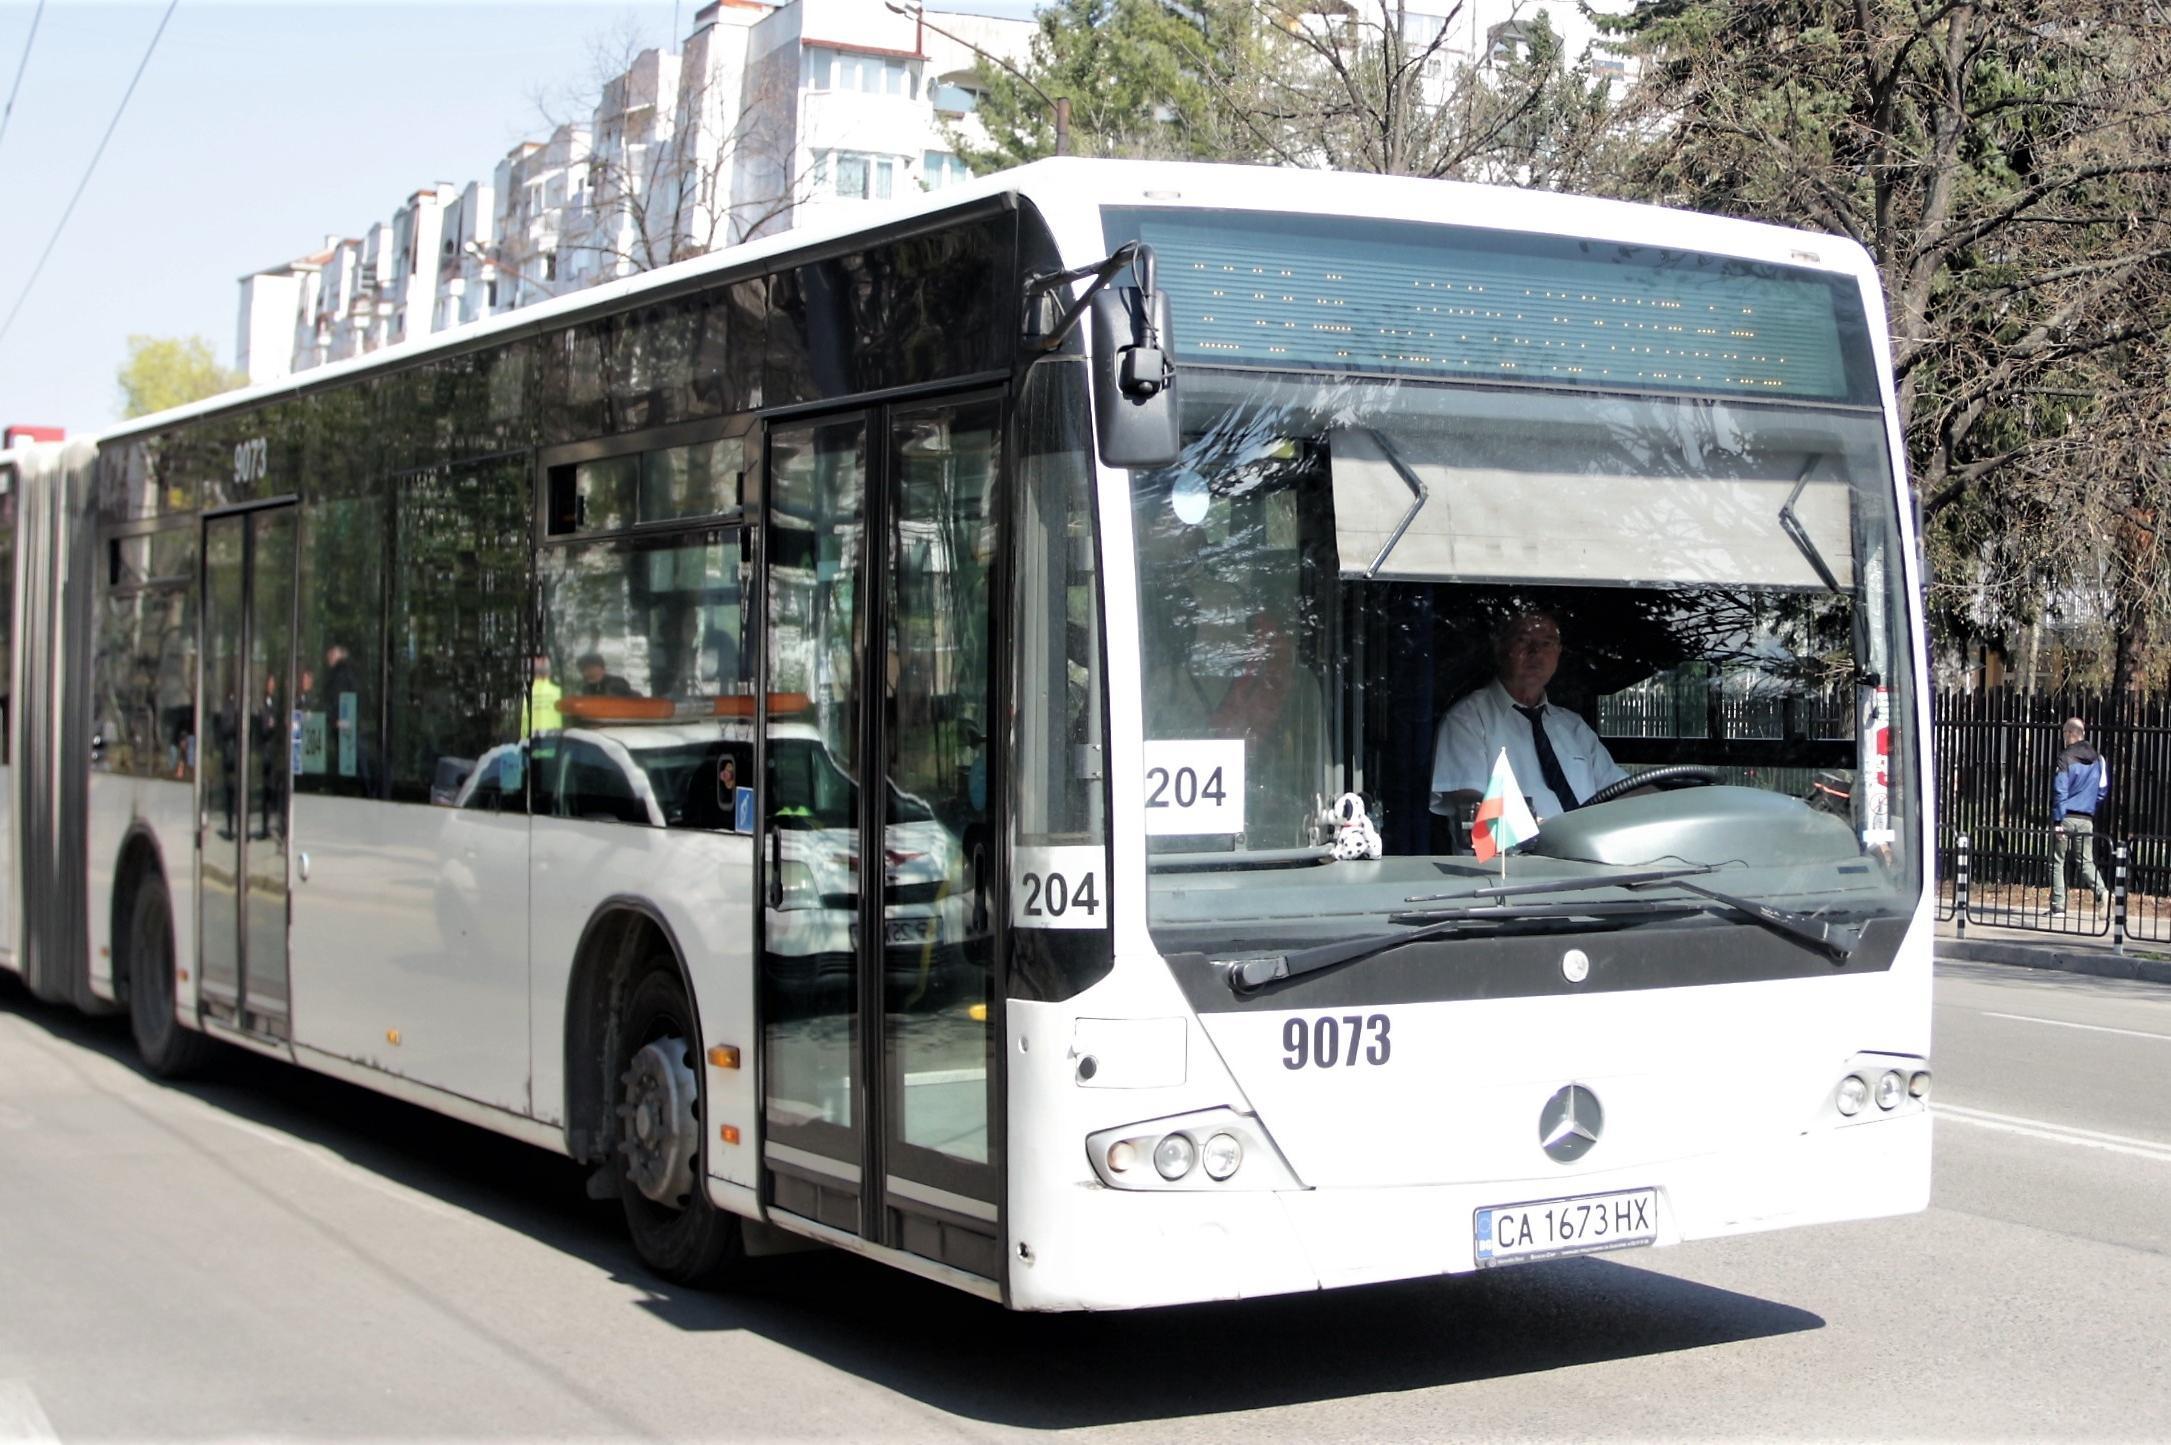 Жена пострада при инцидент в автобус 204